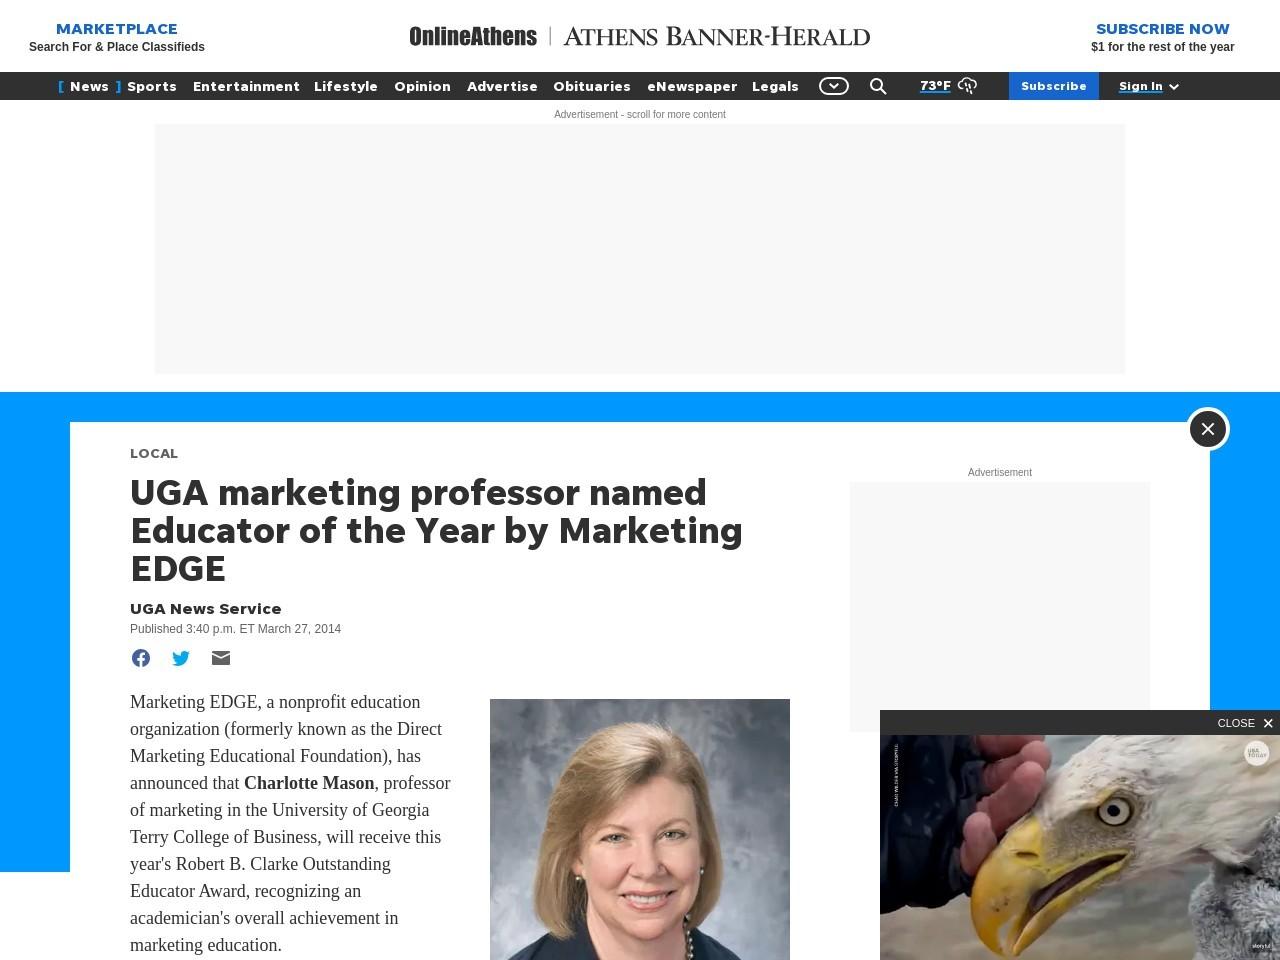 UGA marketing professor named Educator of the Year by Marketing EDGE